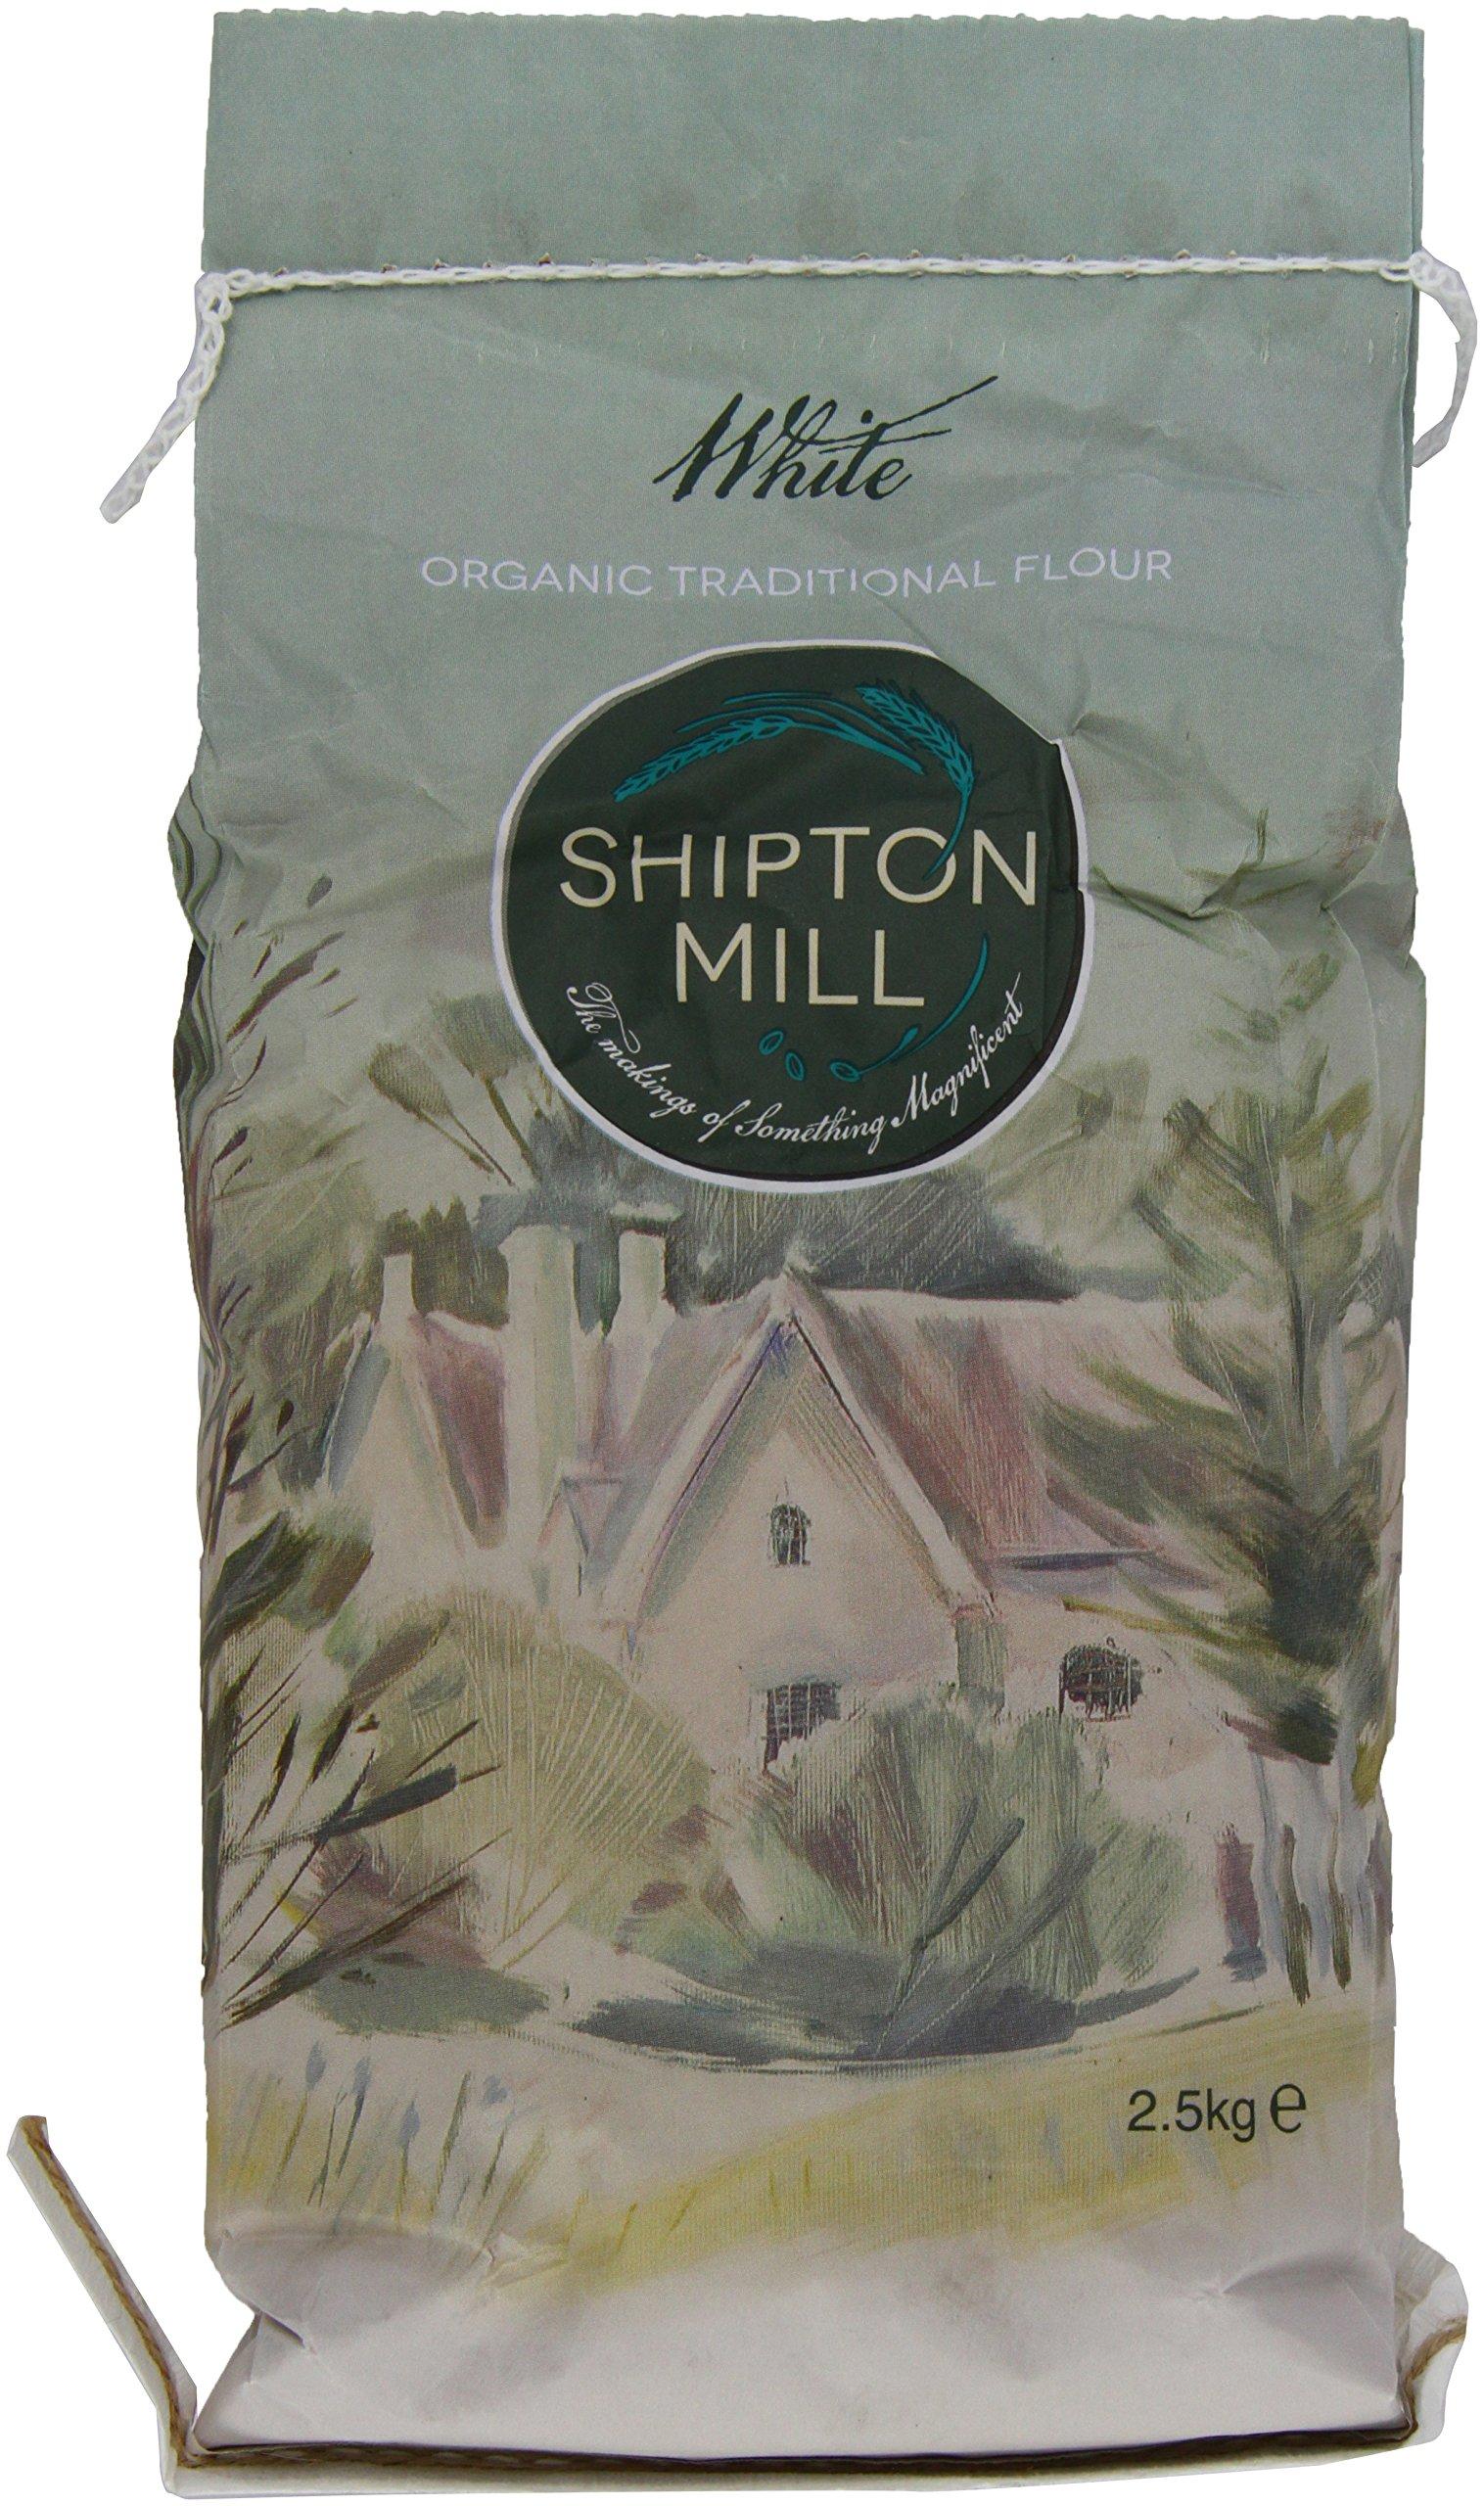 Shipton Mill Organic White Strong Flour 2.5 K g (Pack of 5)